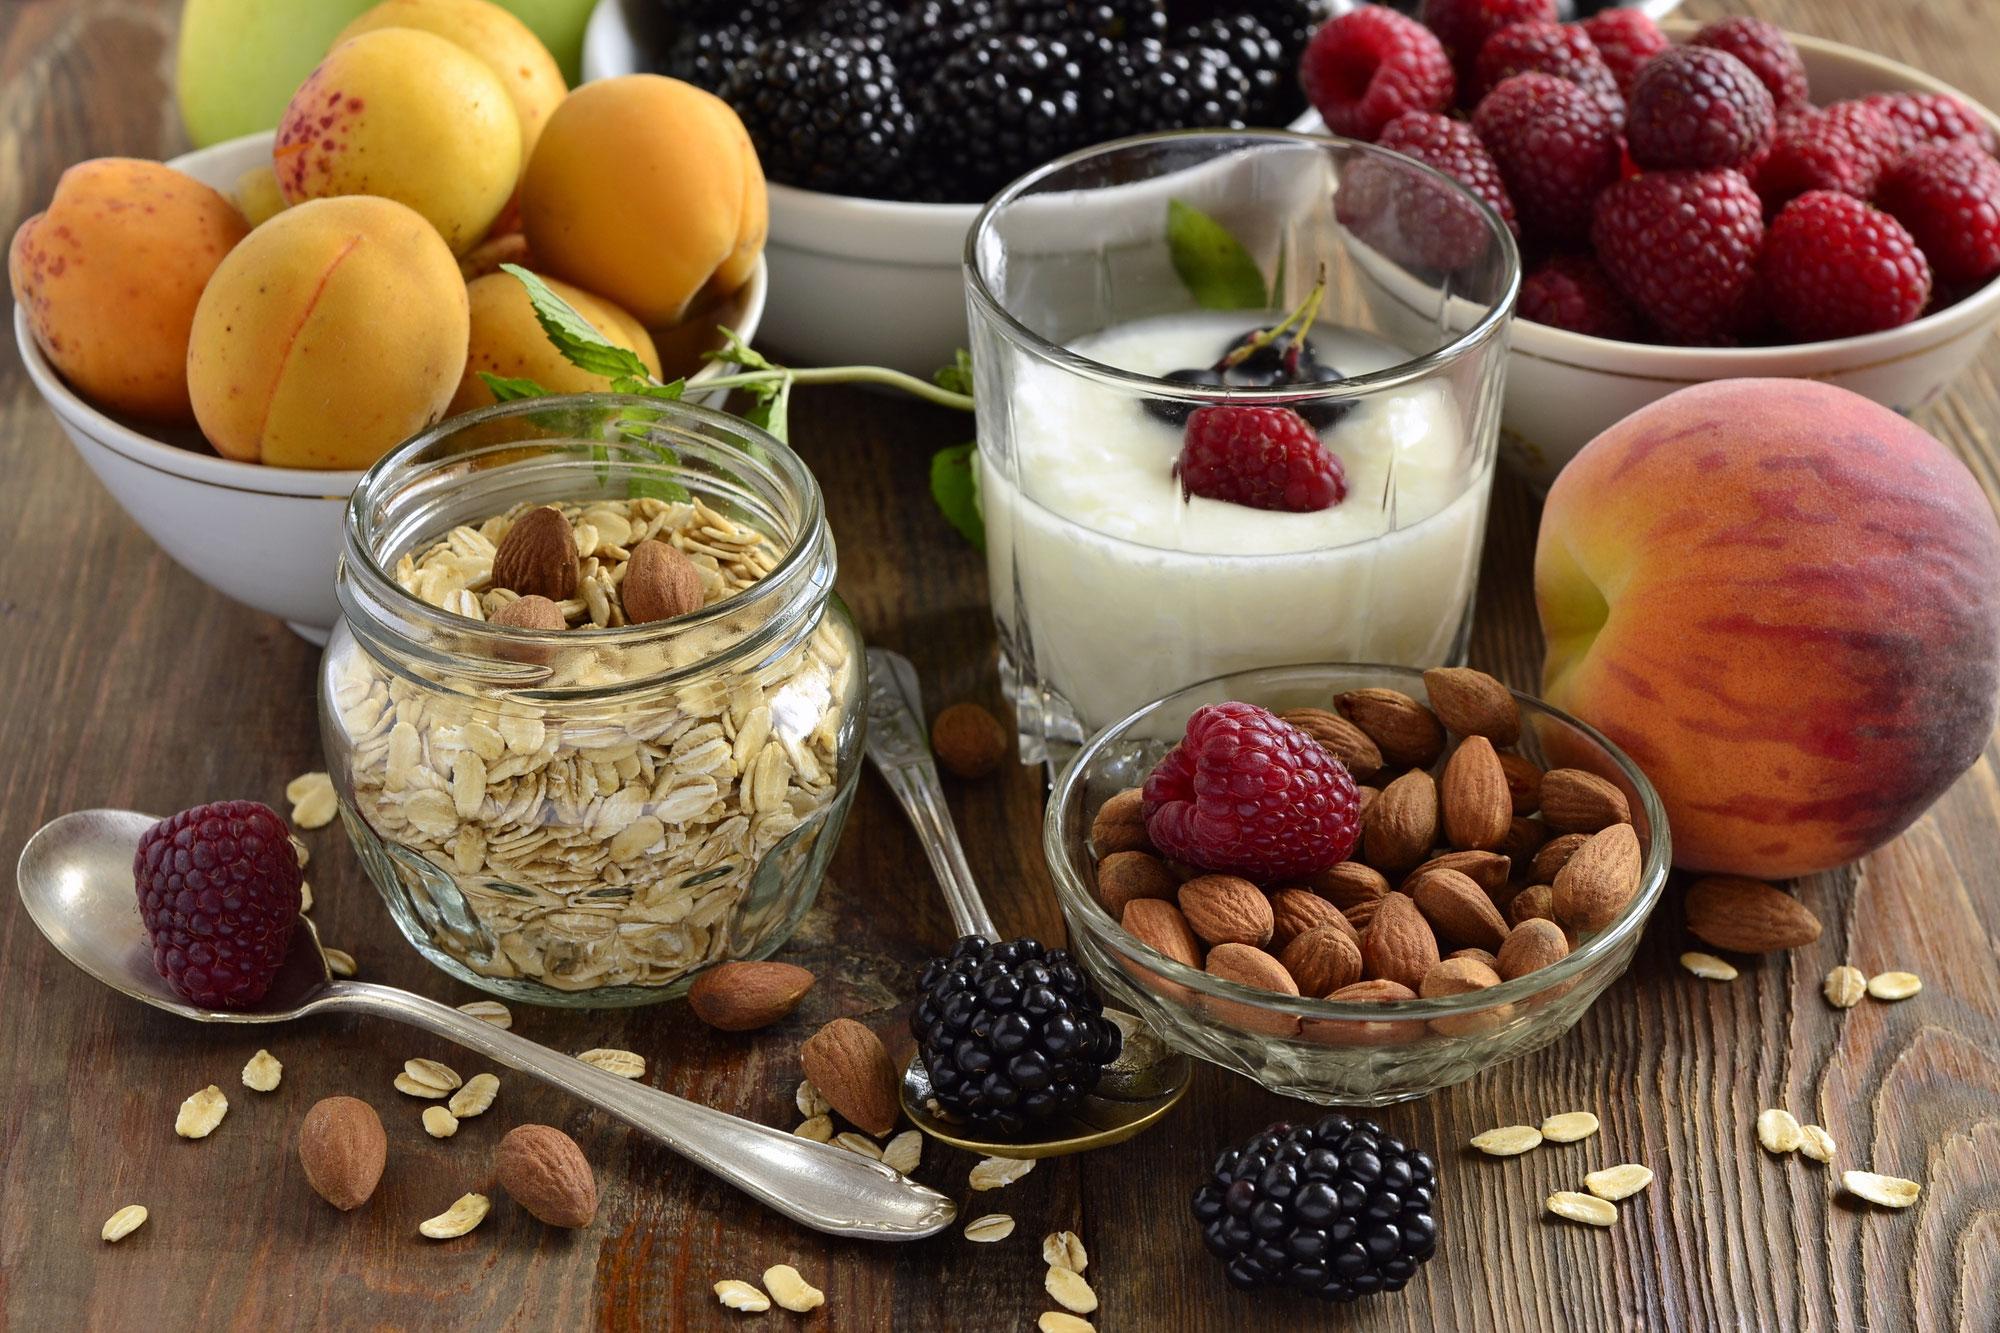 Selbstpflege während der Schwangerschaft - Ernährung